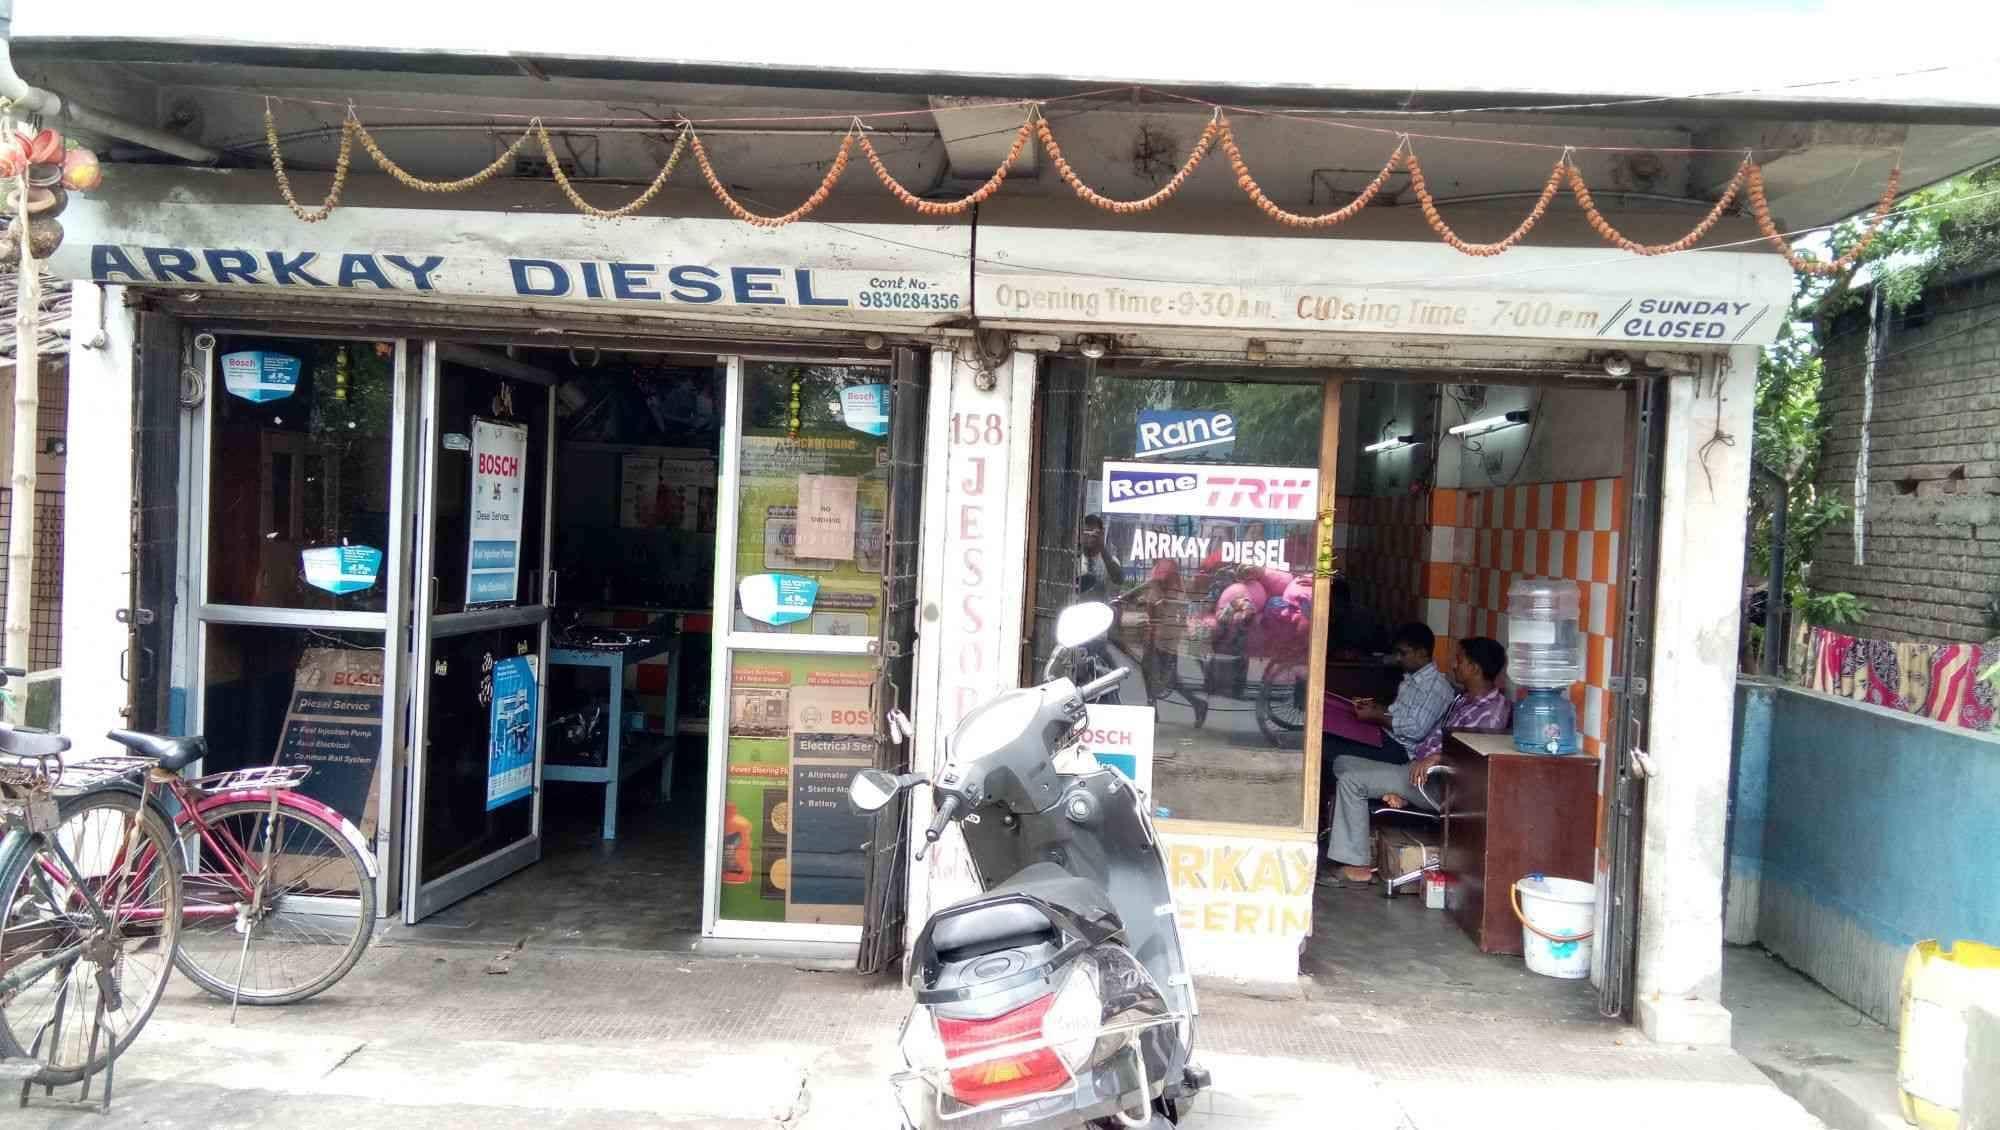 Top 20 Fuel Injection Pump Repair & Services in Kolkata